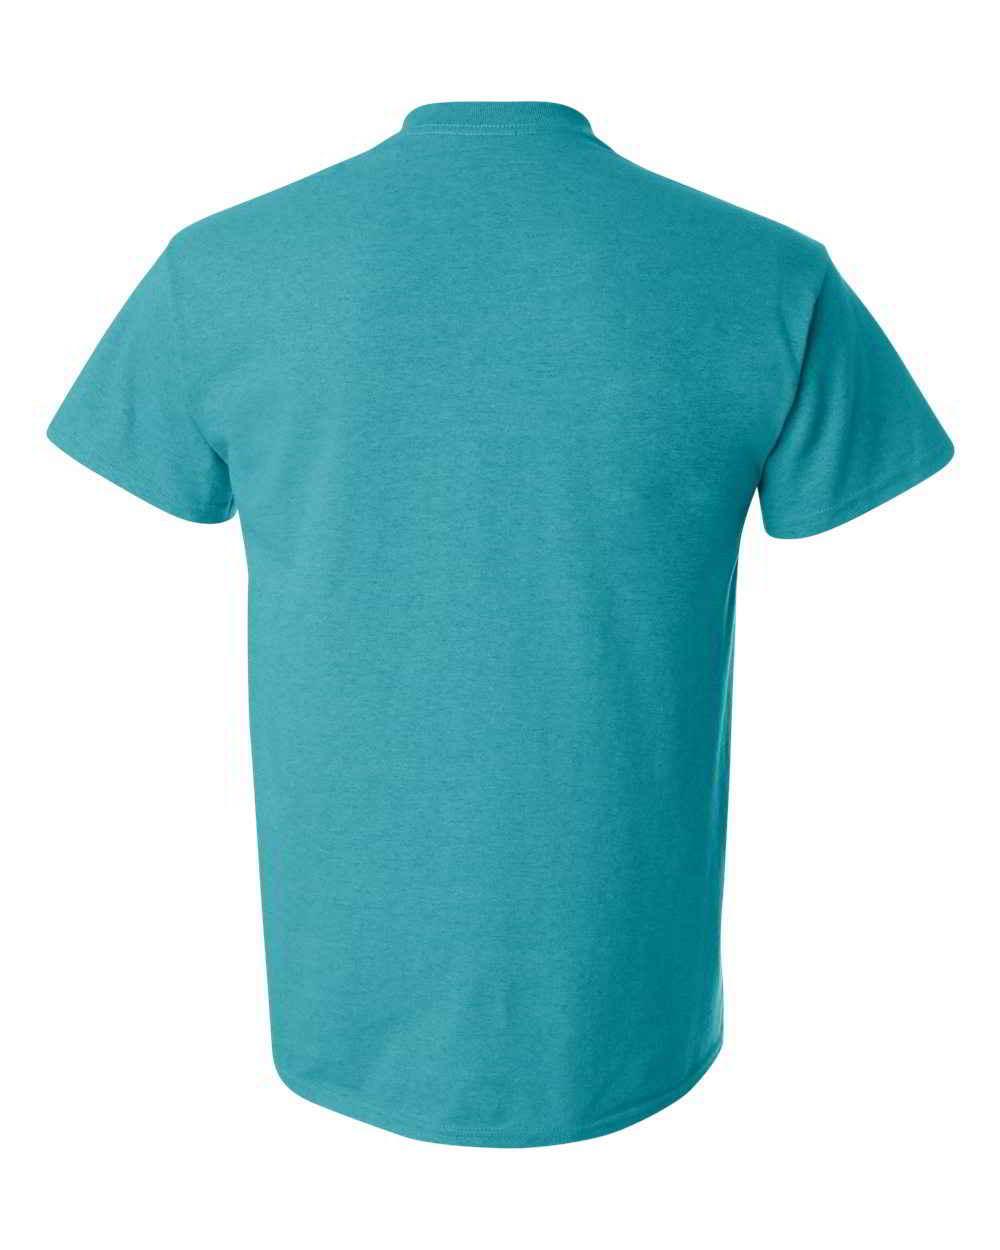 Gildan-Heavy-Cotton-Short-Sleeve-Mens-Blue-T-Shirts-5000 thumbnail 4